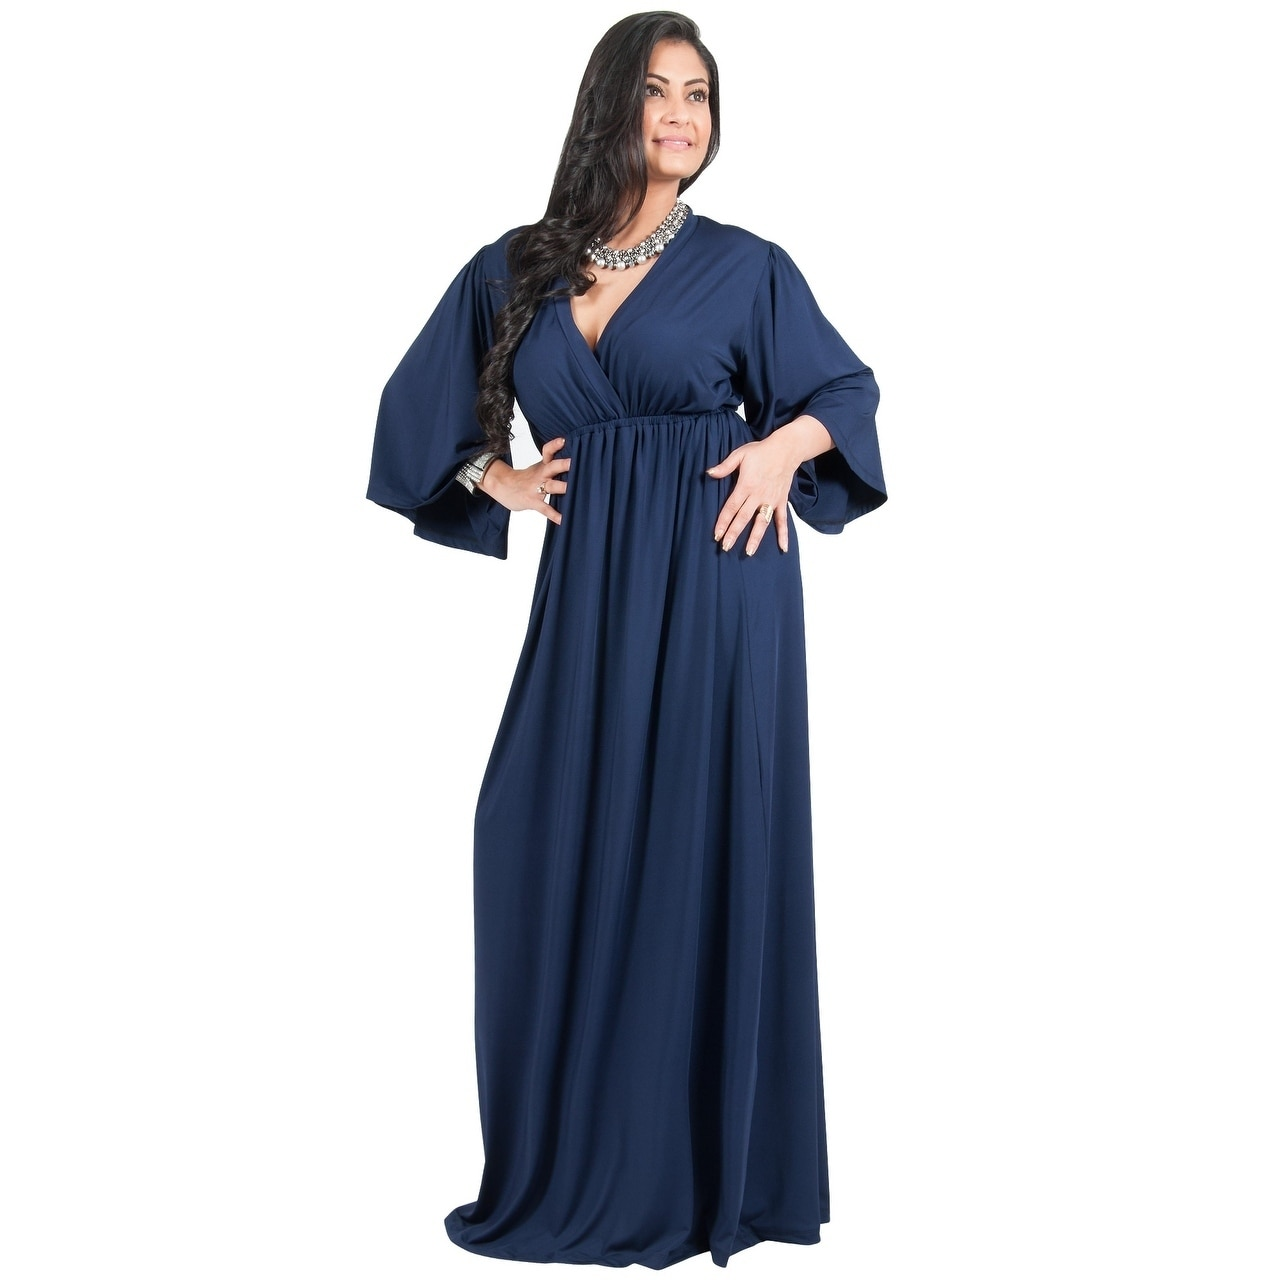 02b7d2a308 Long Sleeve Flowy Dresses Plus Size